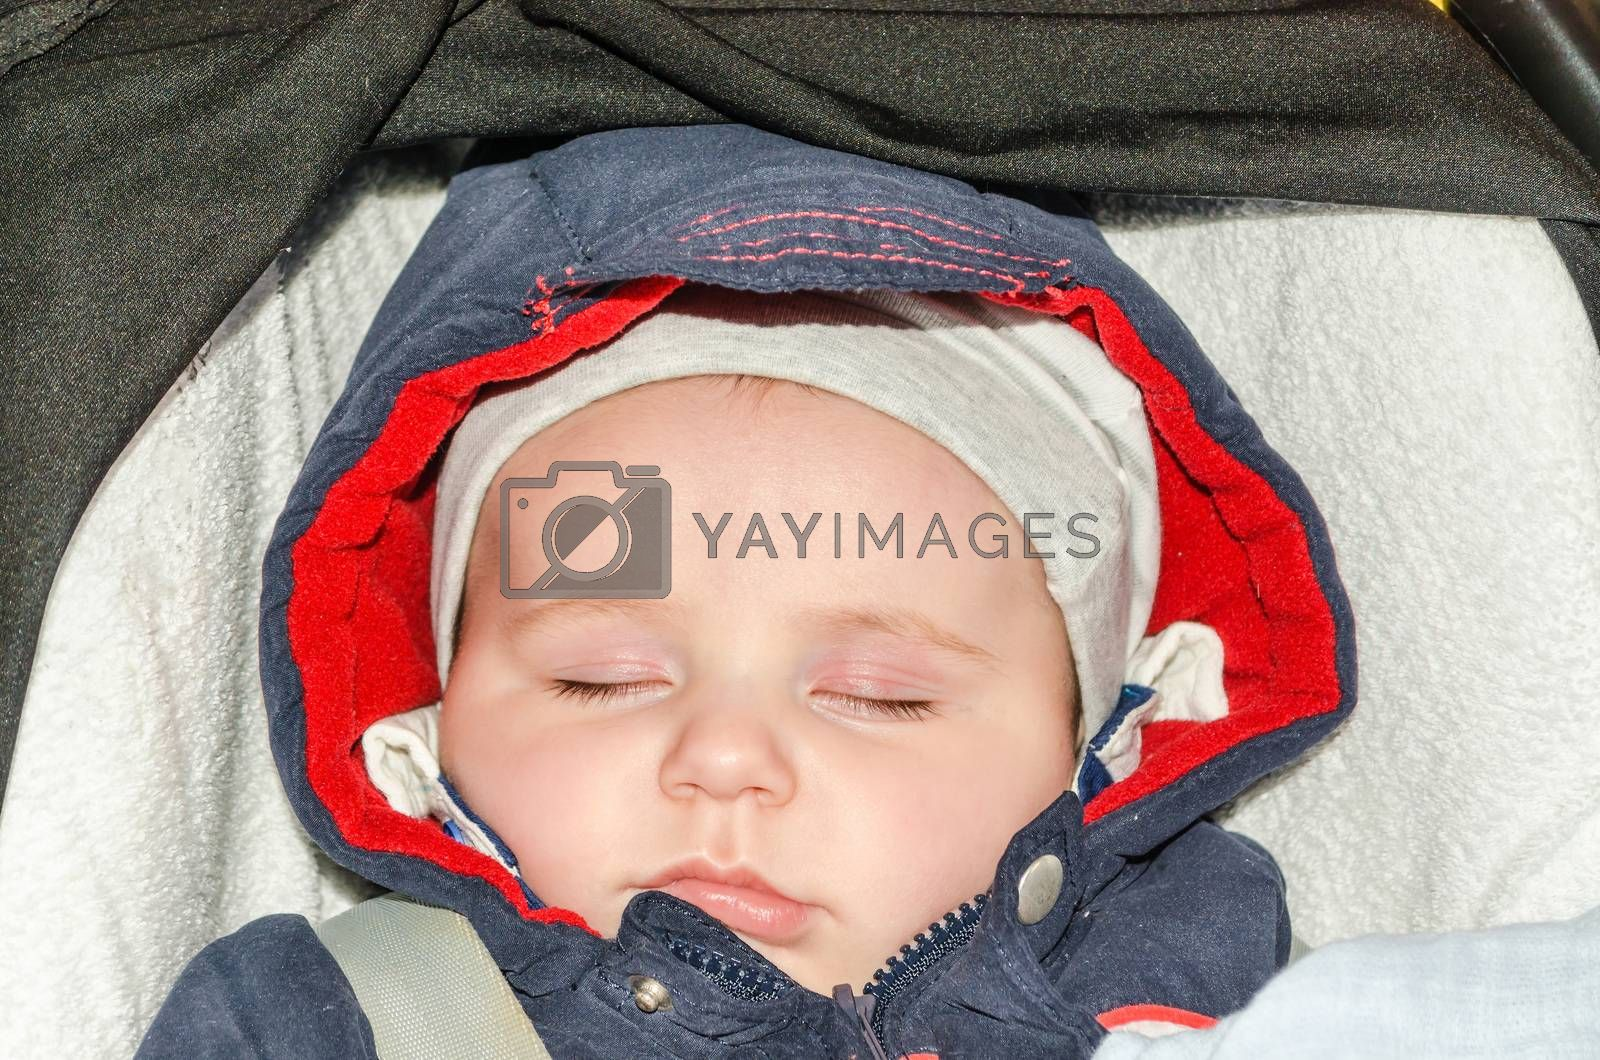 Baby, Toddler is peaceful sleeping.